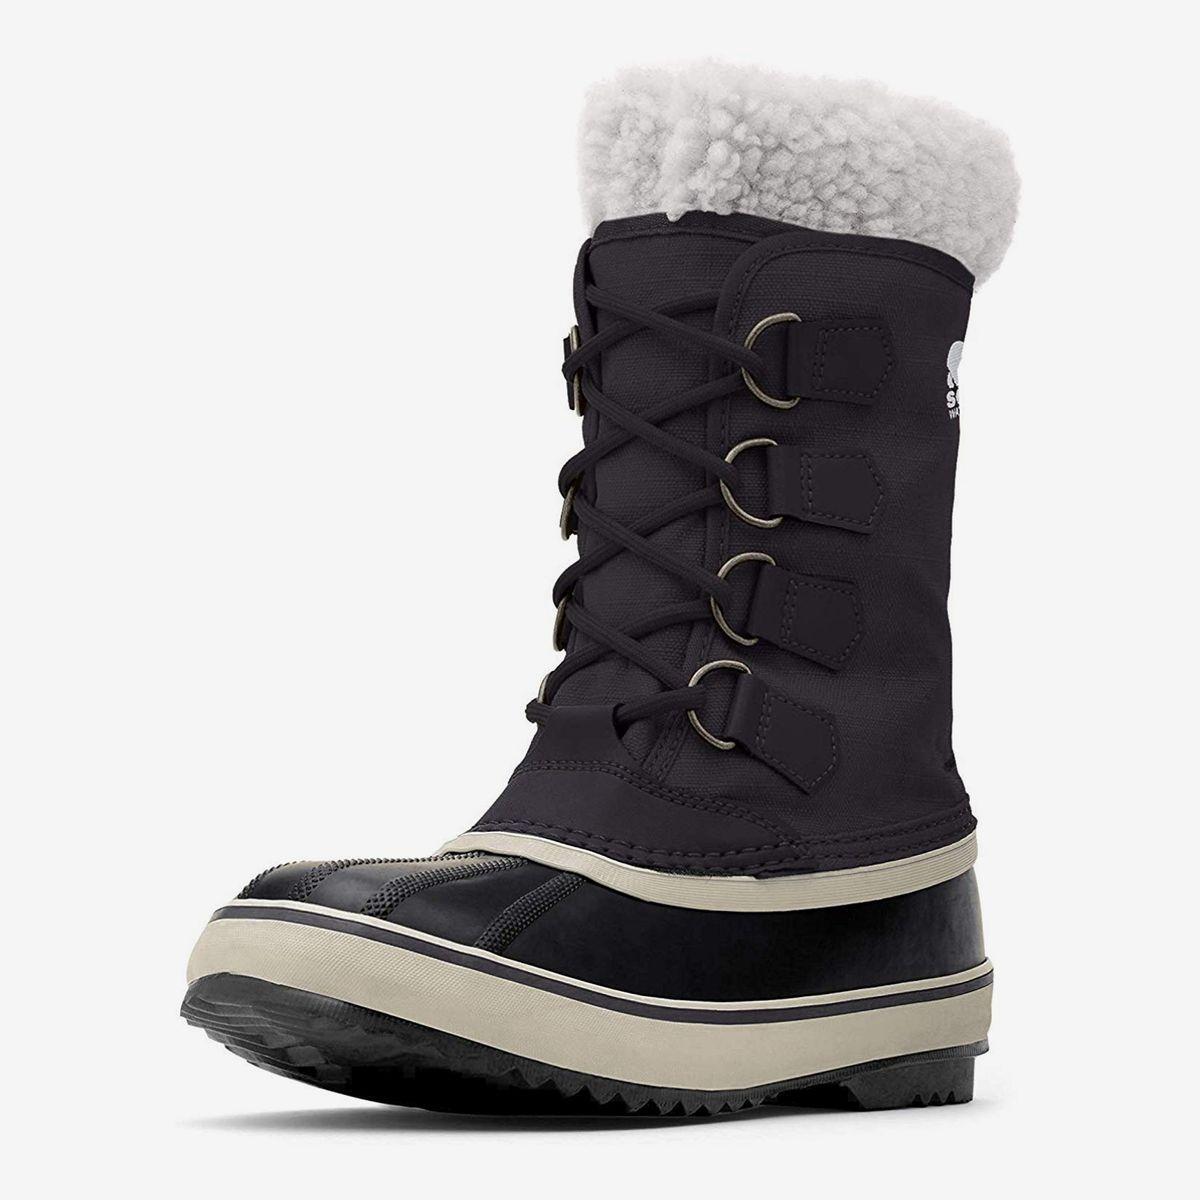 sorel women's winter boots sale